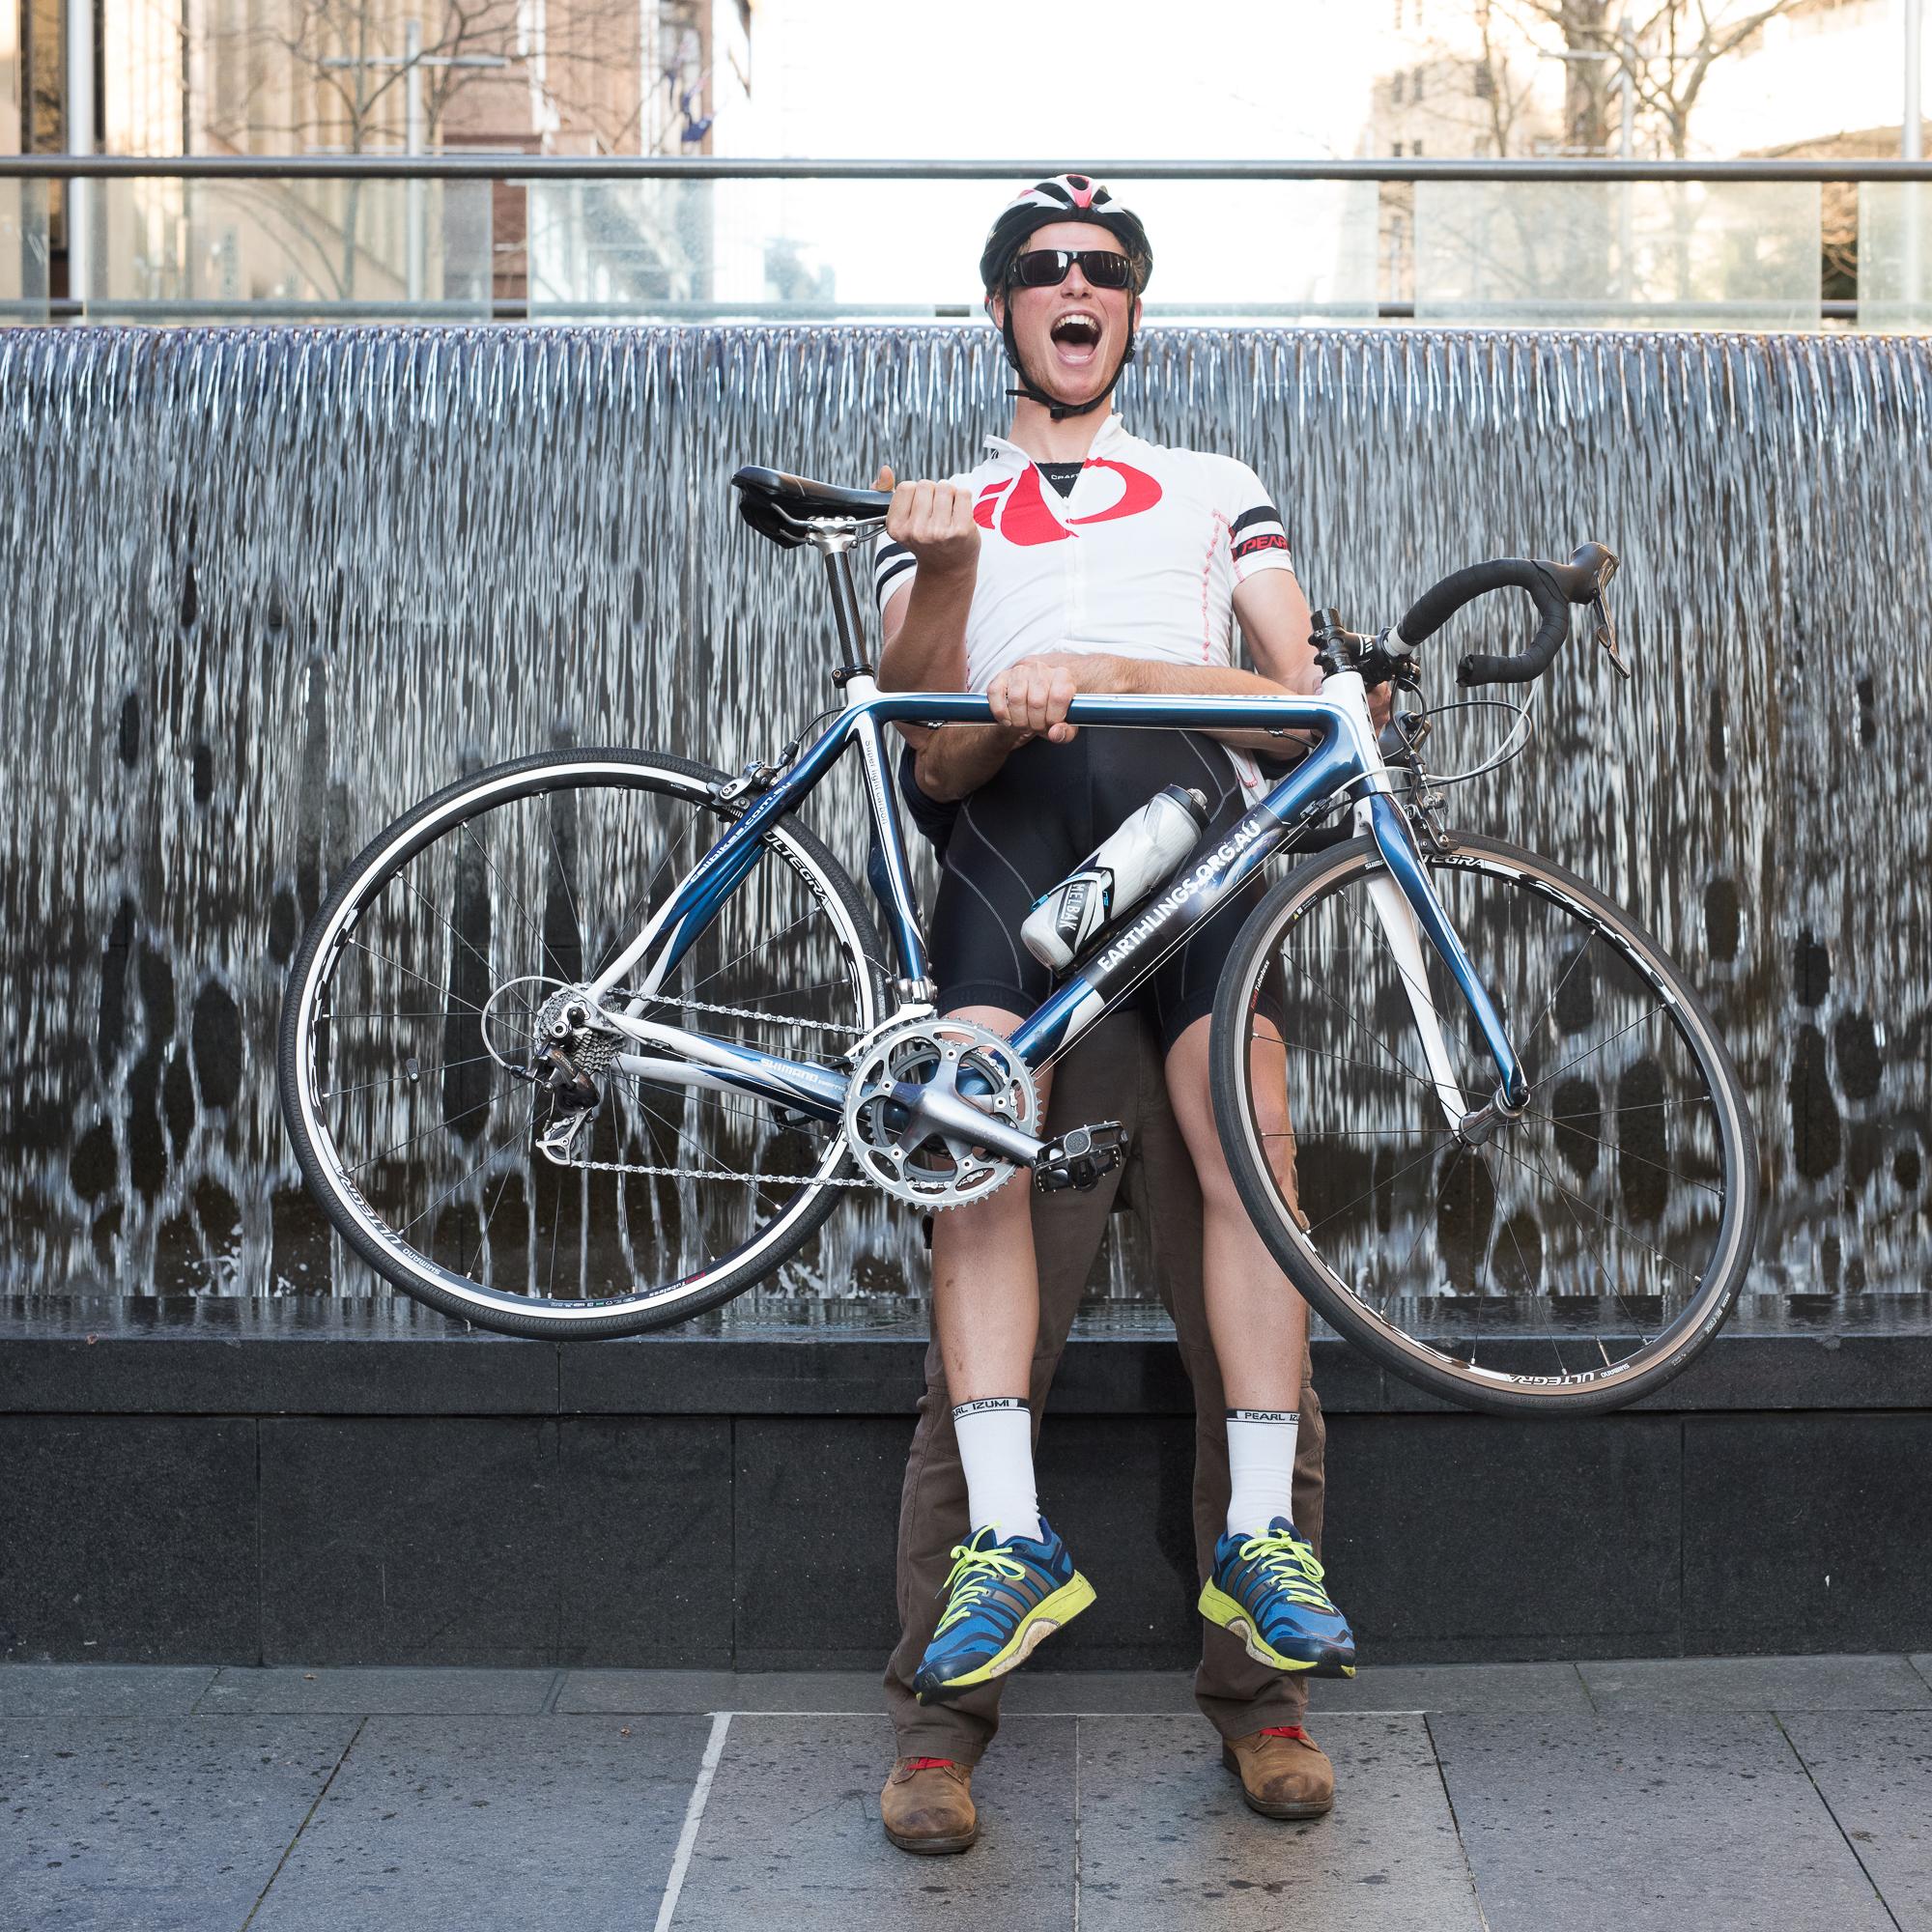 Martin Place Sydney - Bike, helmet and glasses